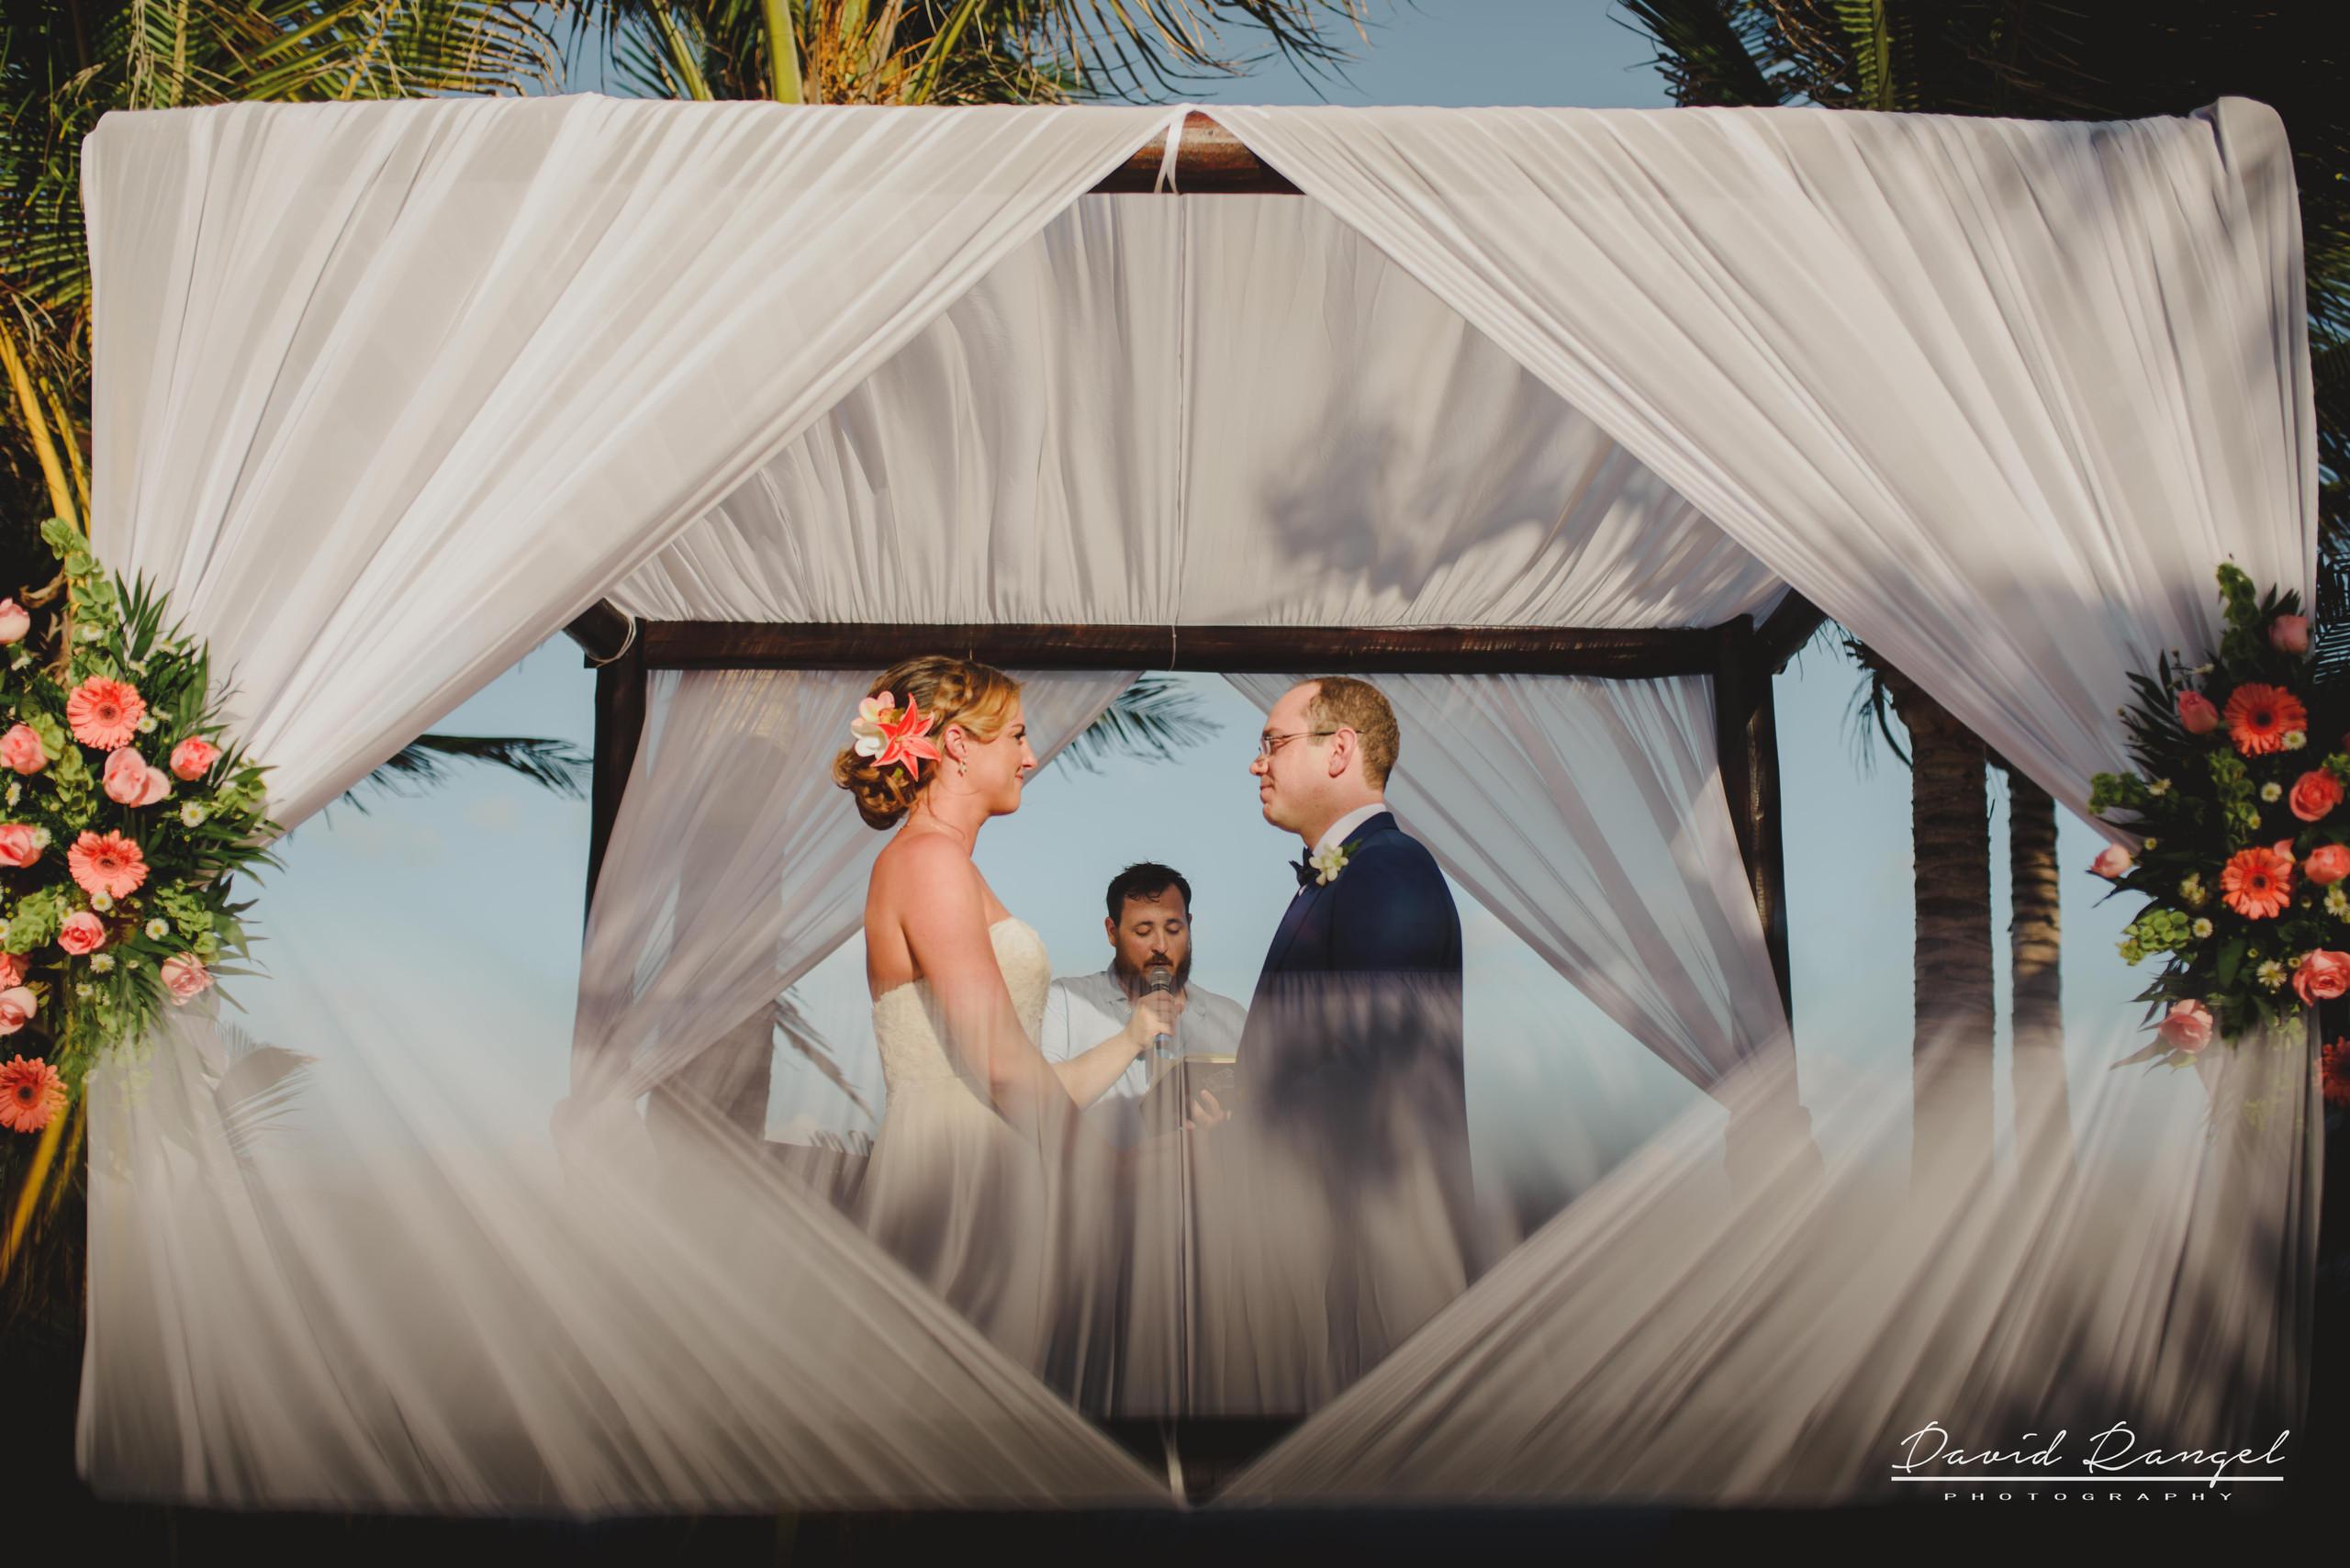 wedding+gazebo+beach+ceremony+photo+groom+bride+reflection